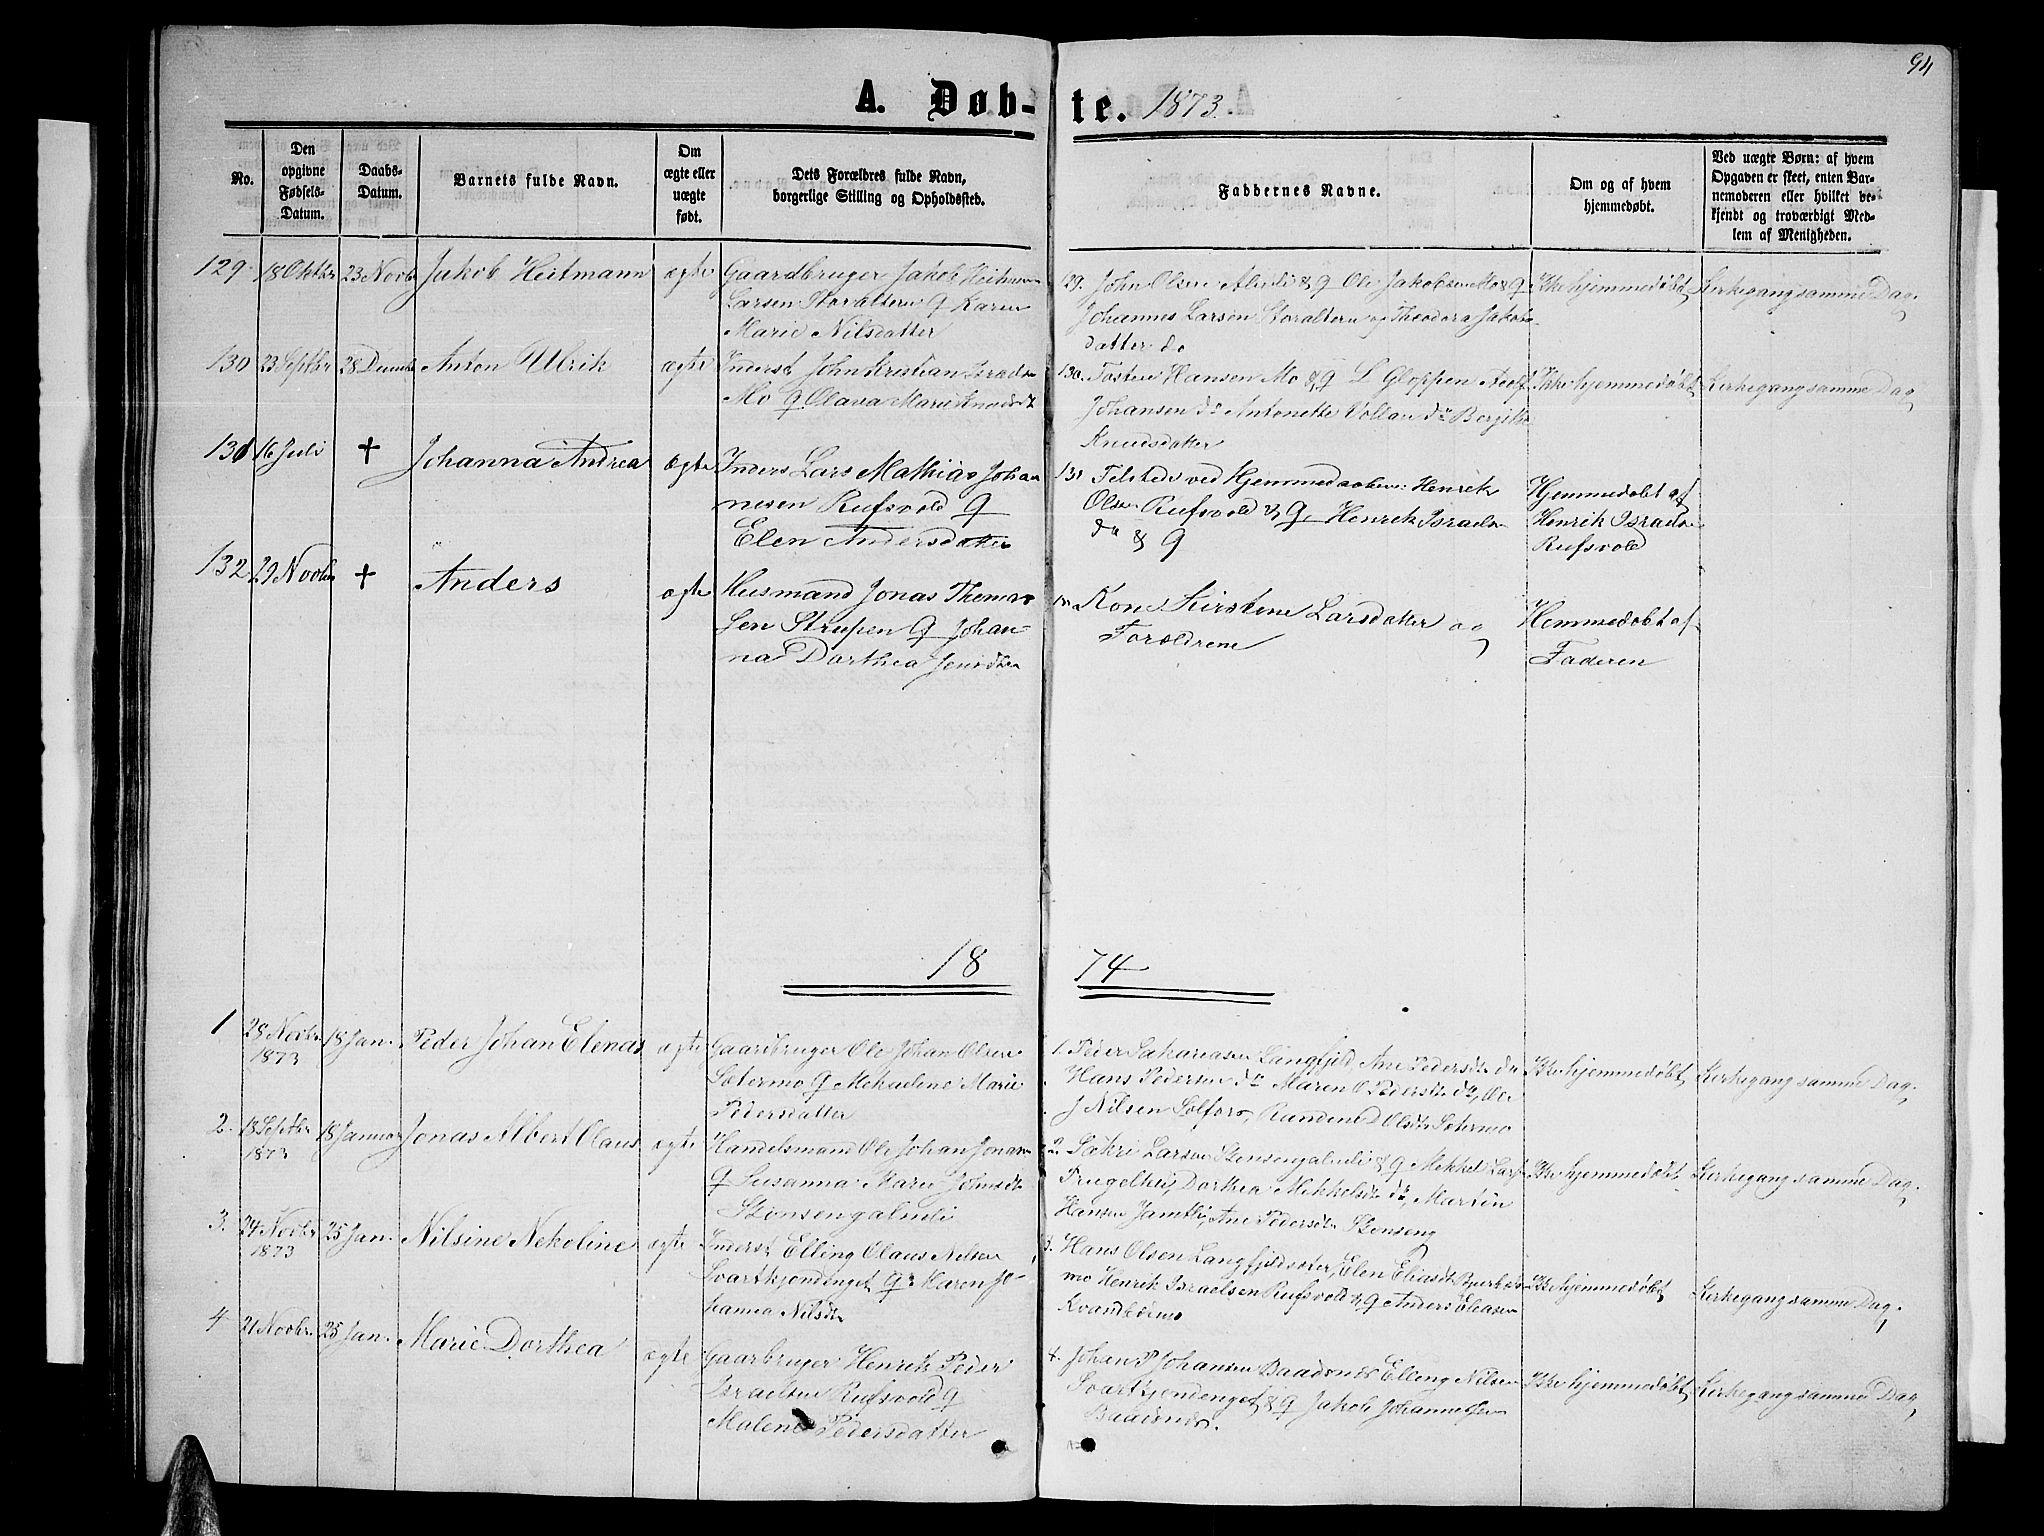 SAT, Ministerialprotokoller, klokkerbøker og fødselsregistre - Nordland, 827/L0415: Klokkerbok nr. 827C04, 1864-1886, s. 94